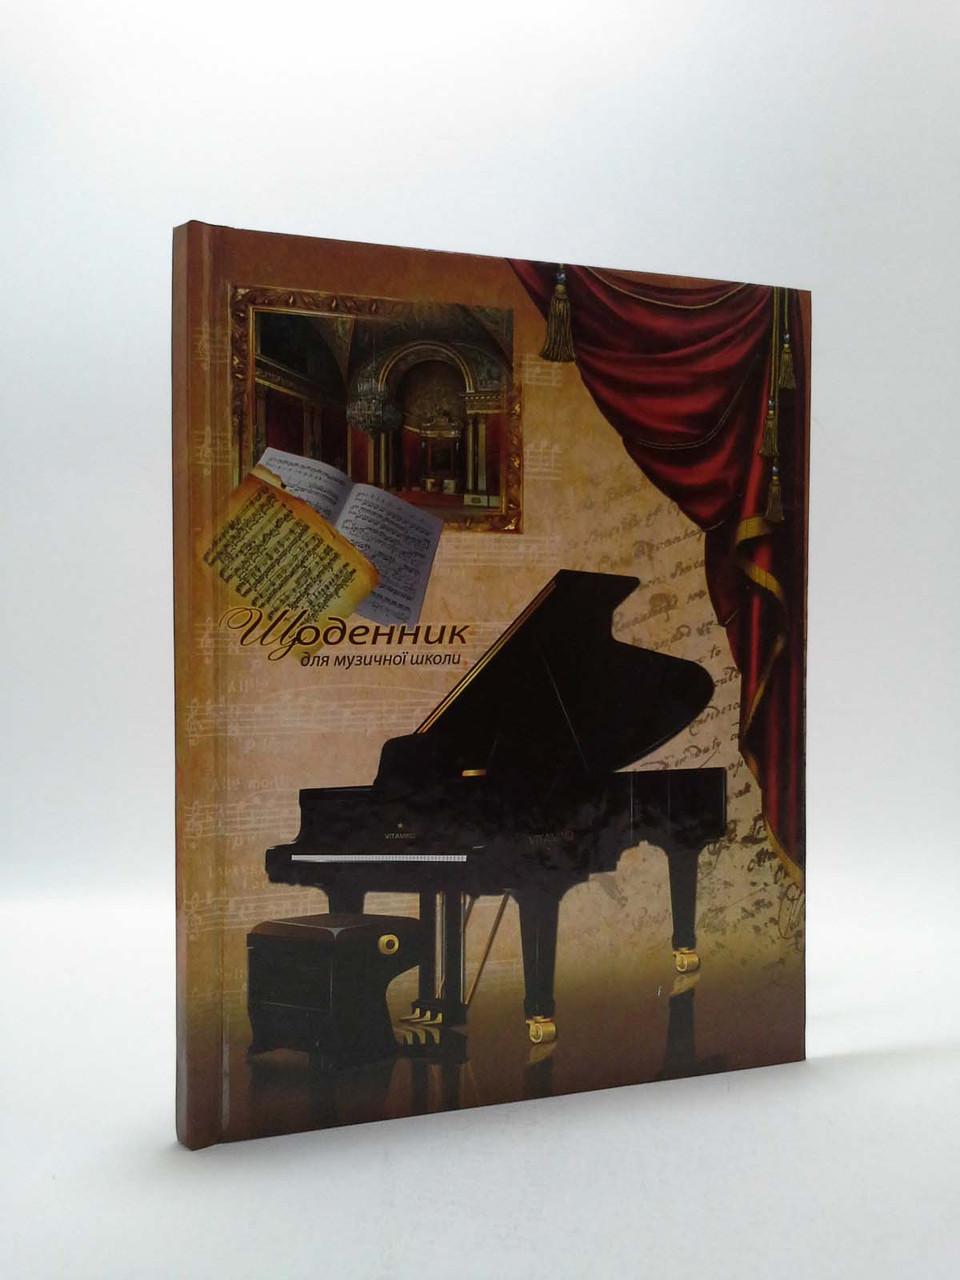 Уч Кредо Щоденник для музичної школи Рояль